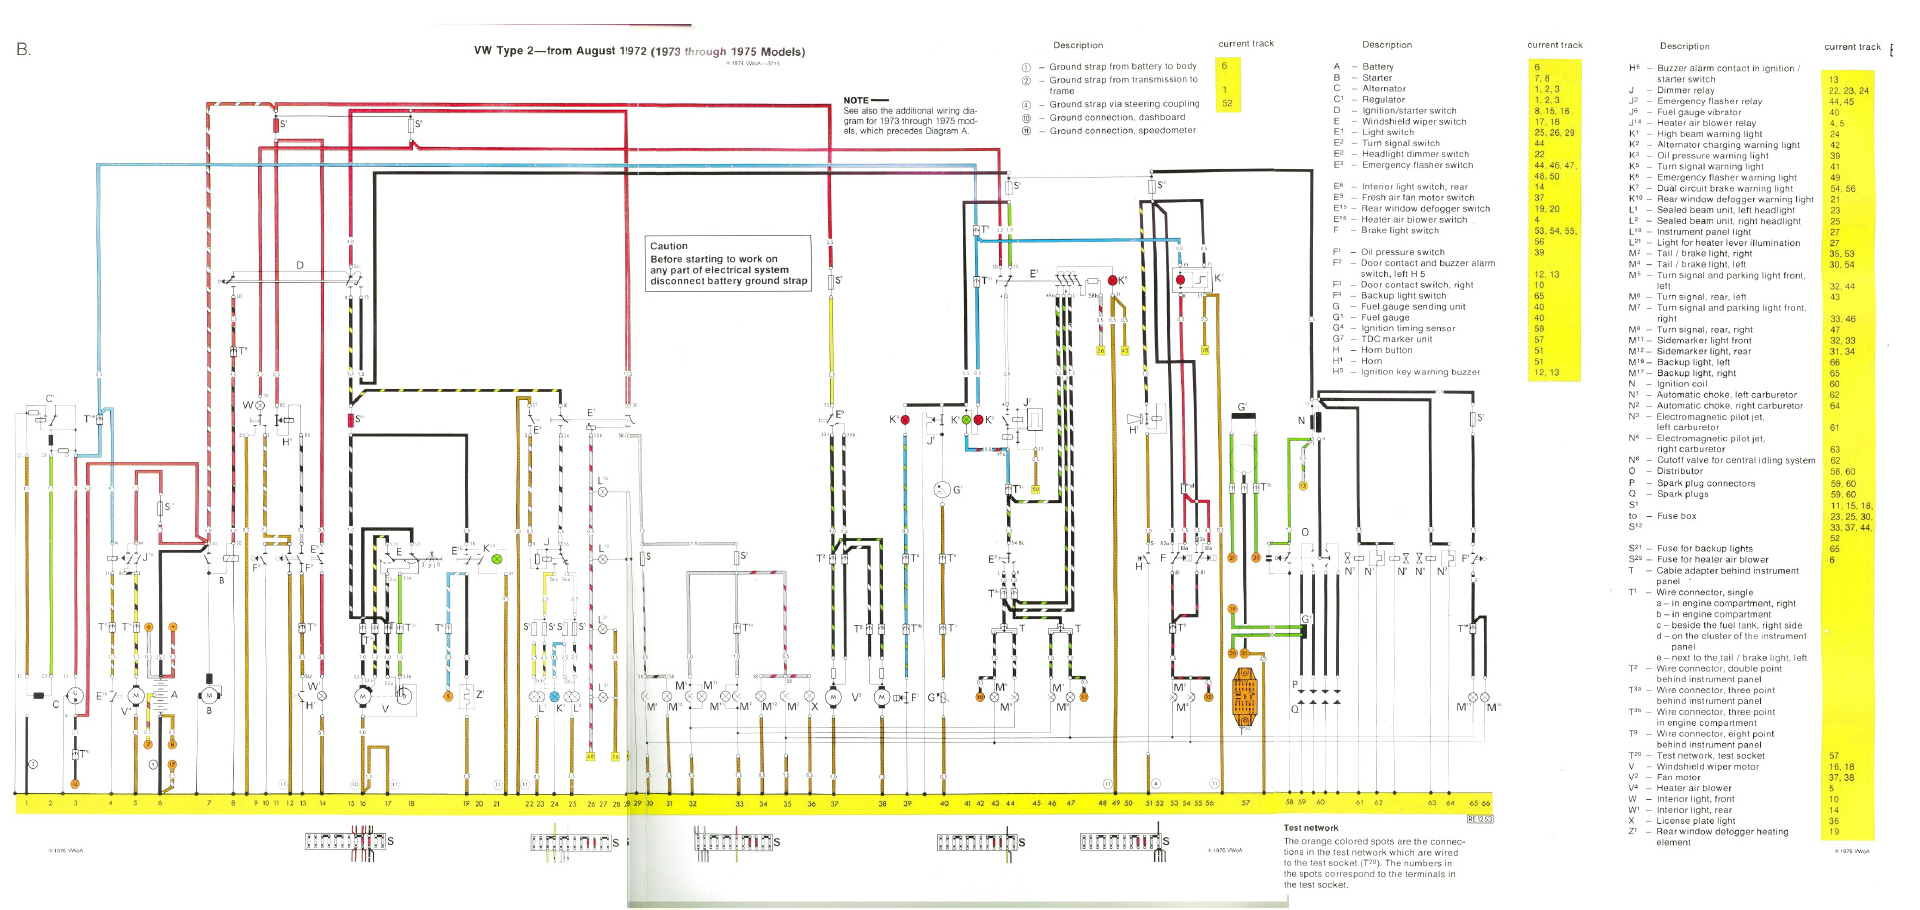 1968 vw beetle alternator wiring diagram wiring diagram and schematics. Black Bedroom Furniture Sets. Home Design Ideas